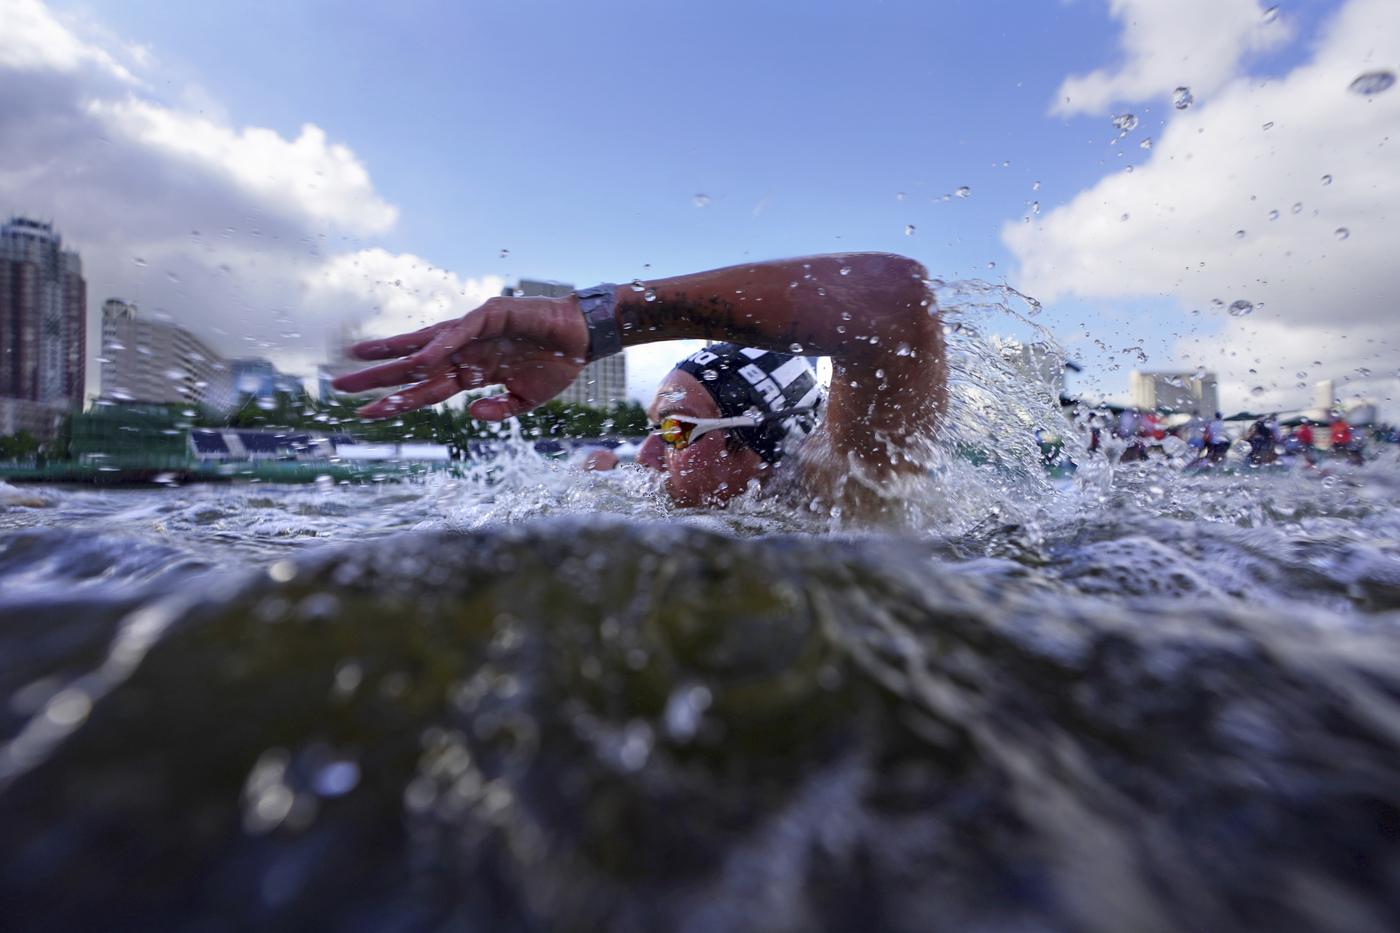 Nuoto di fondo, Olimpiadi Tokyo: Ana Marcela Cunha oro nella 10 km, Rachele Bruni mai in gara